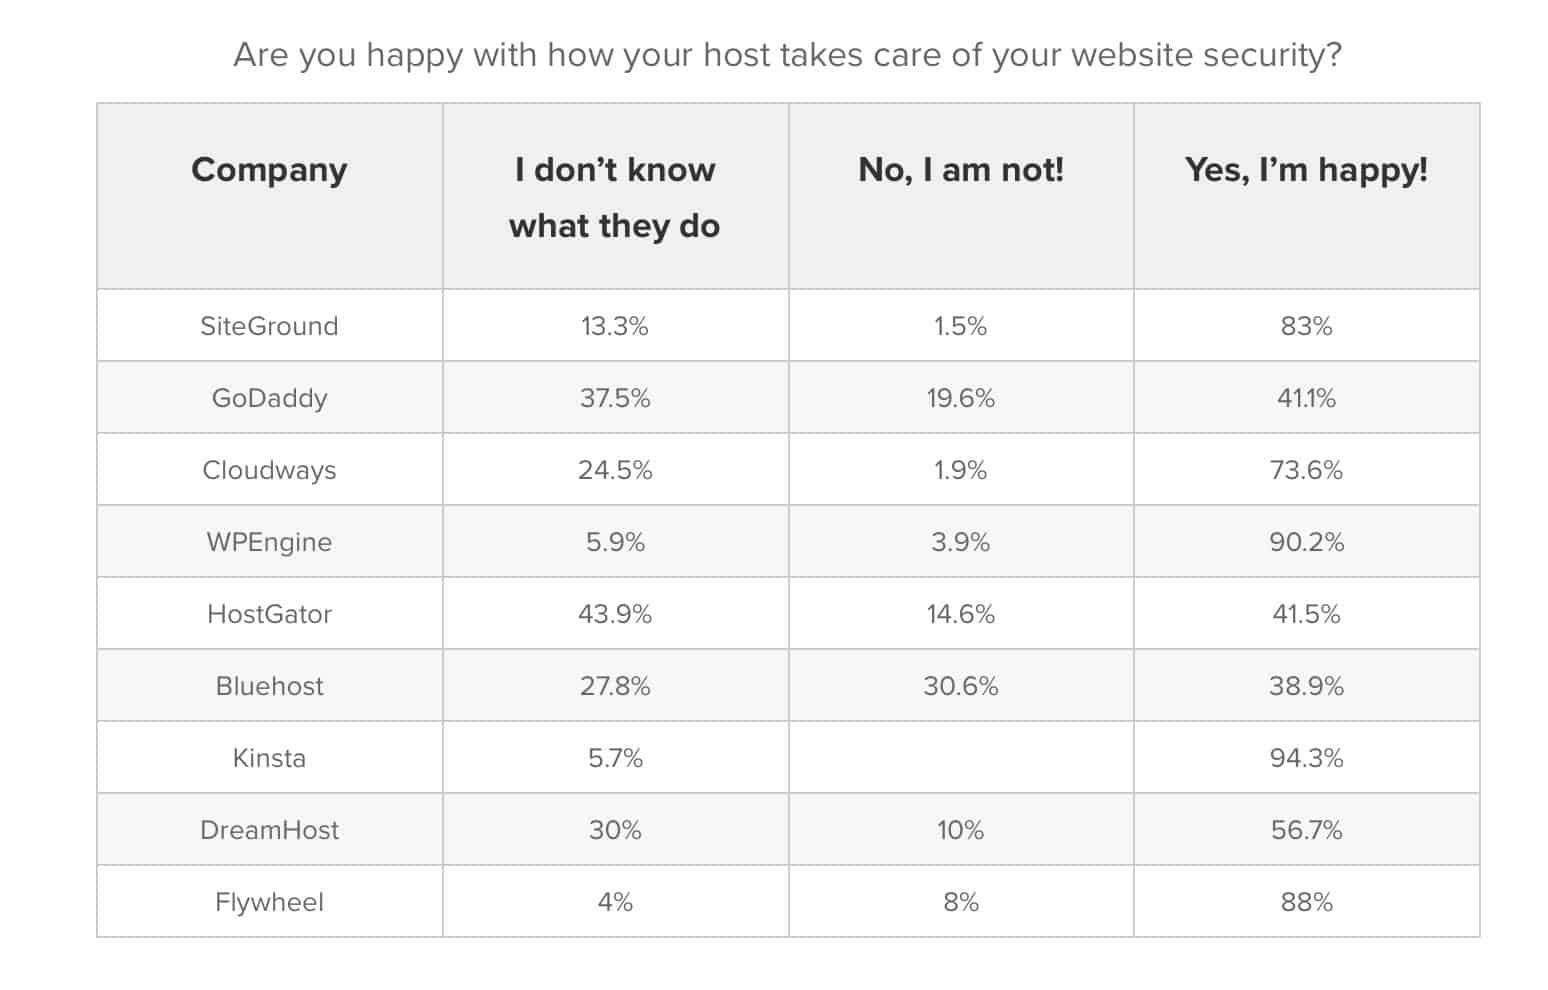 Kinsta Web Security Client Satisfaction